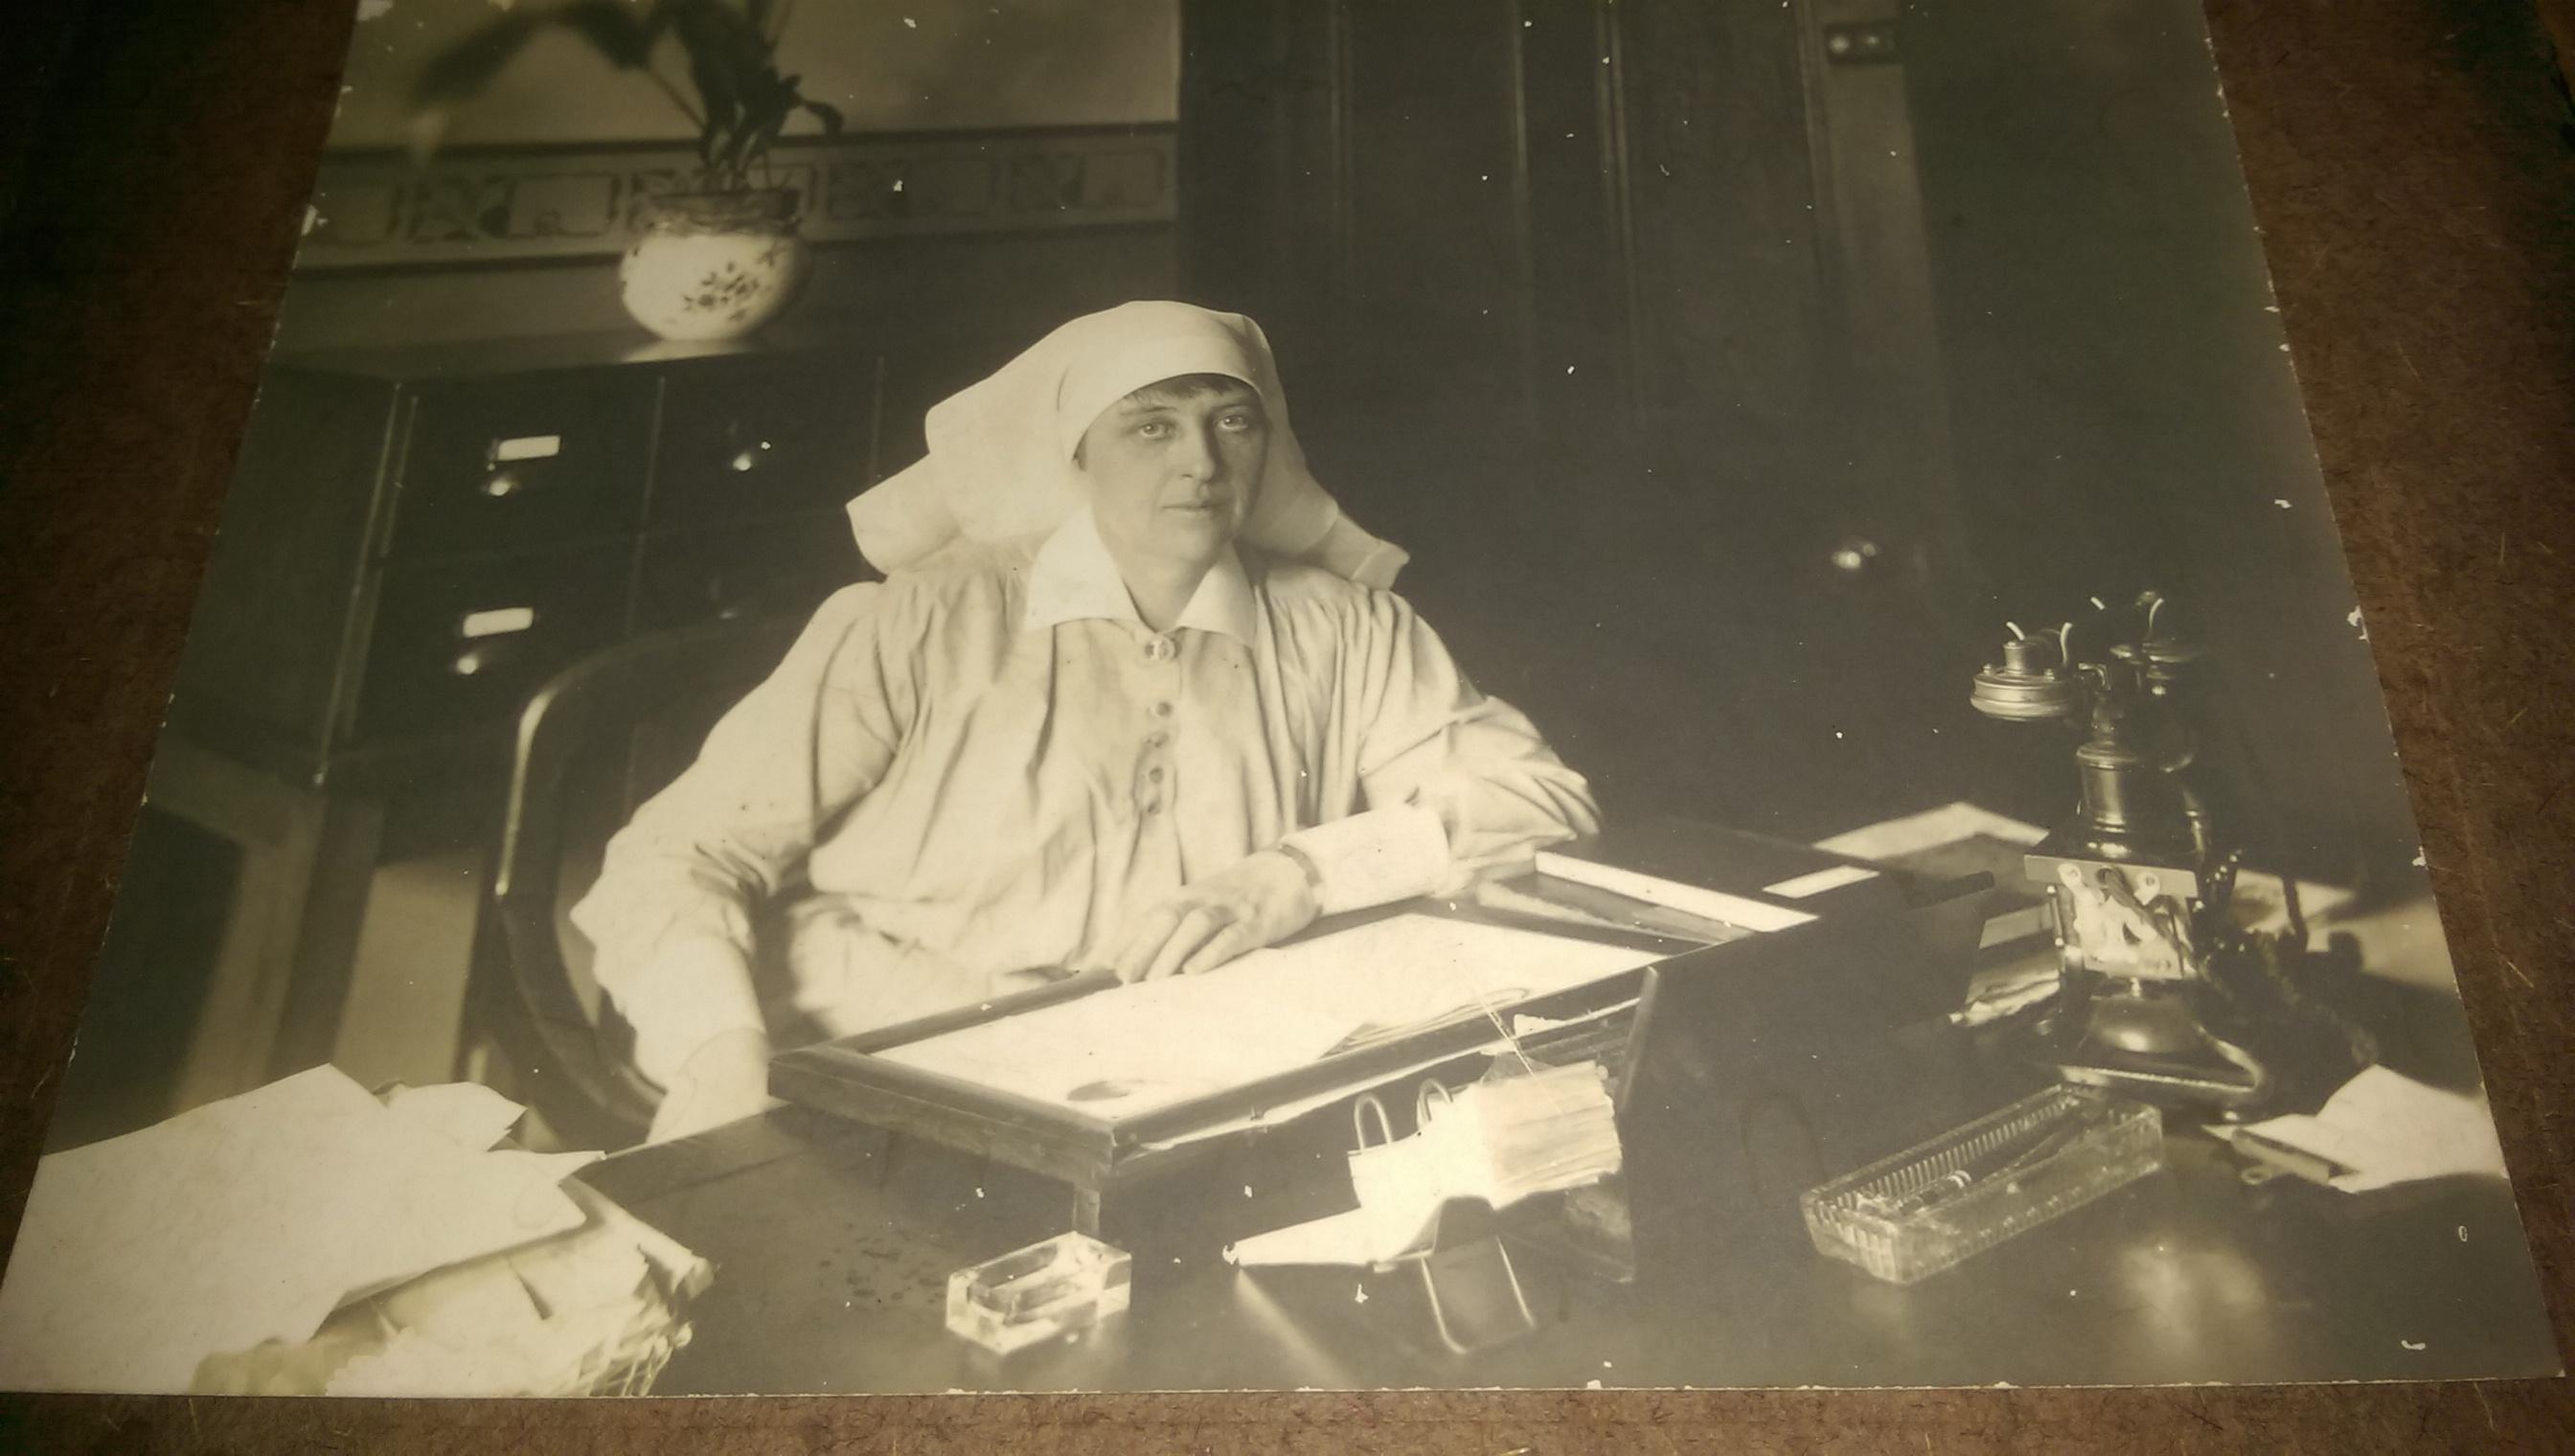 MATRON CLEMENTINA MARSHALL WORKING AT SYDNEY HOSPITAL MATRONS DESK AUGUST 1921